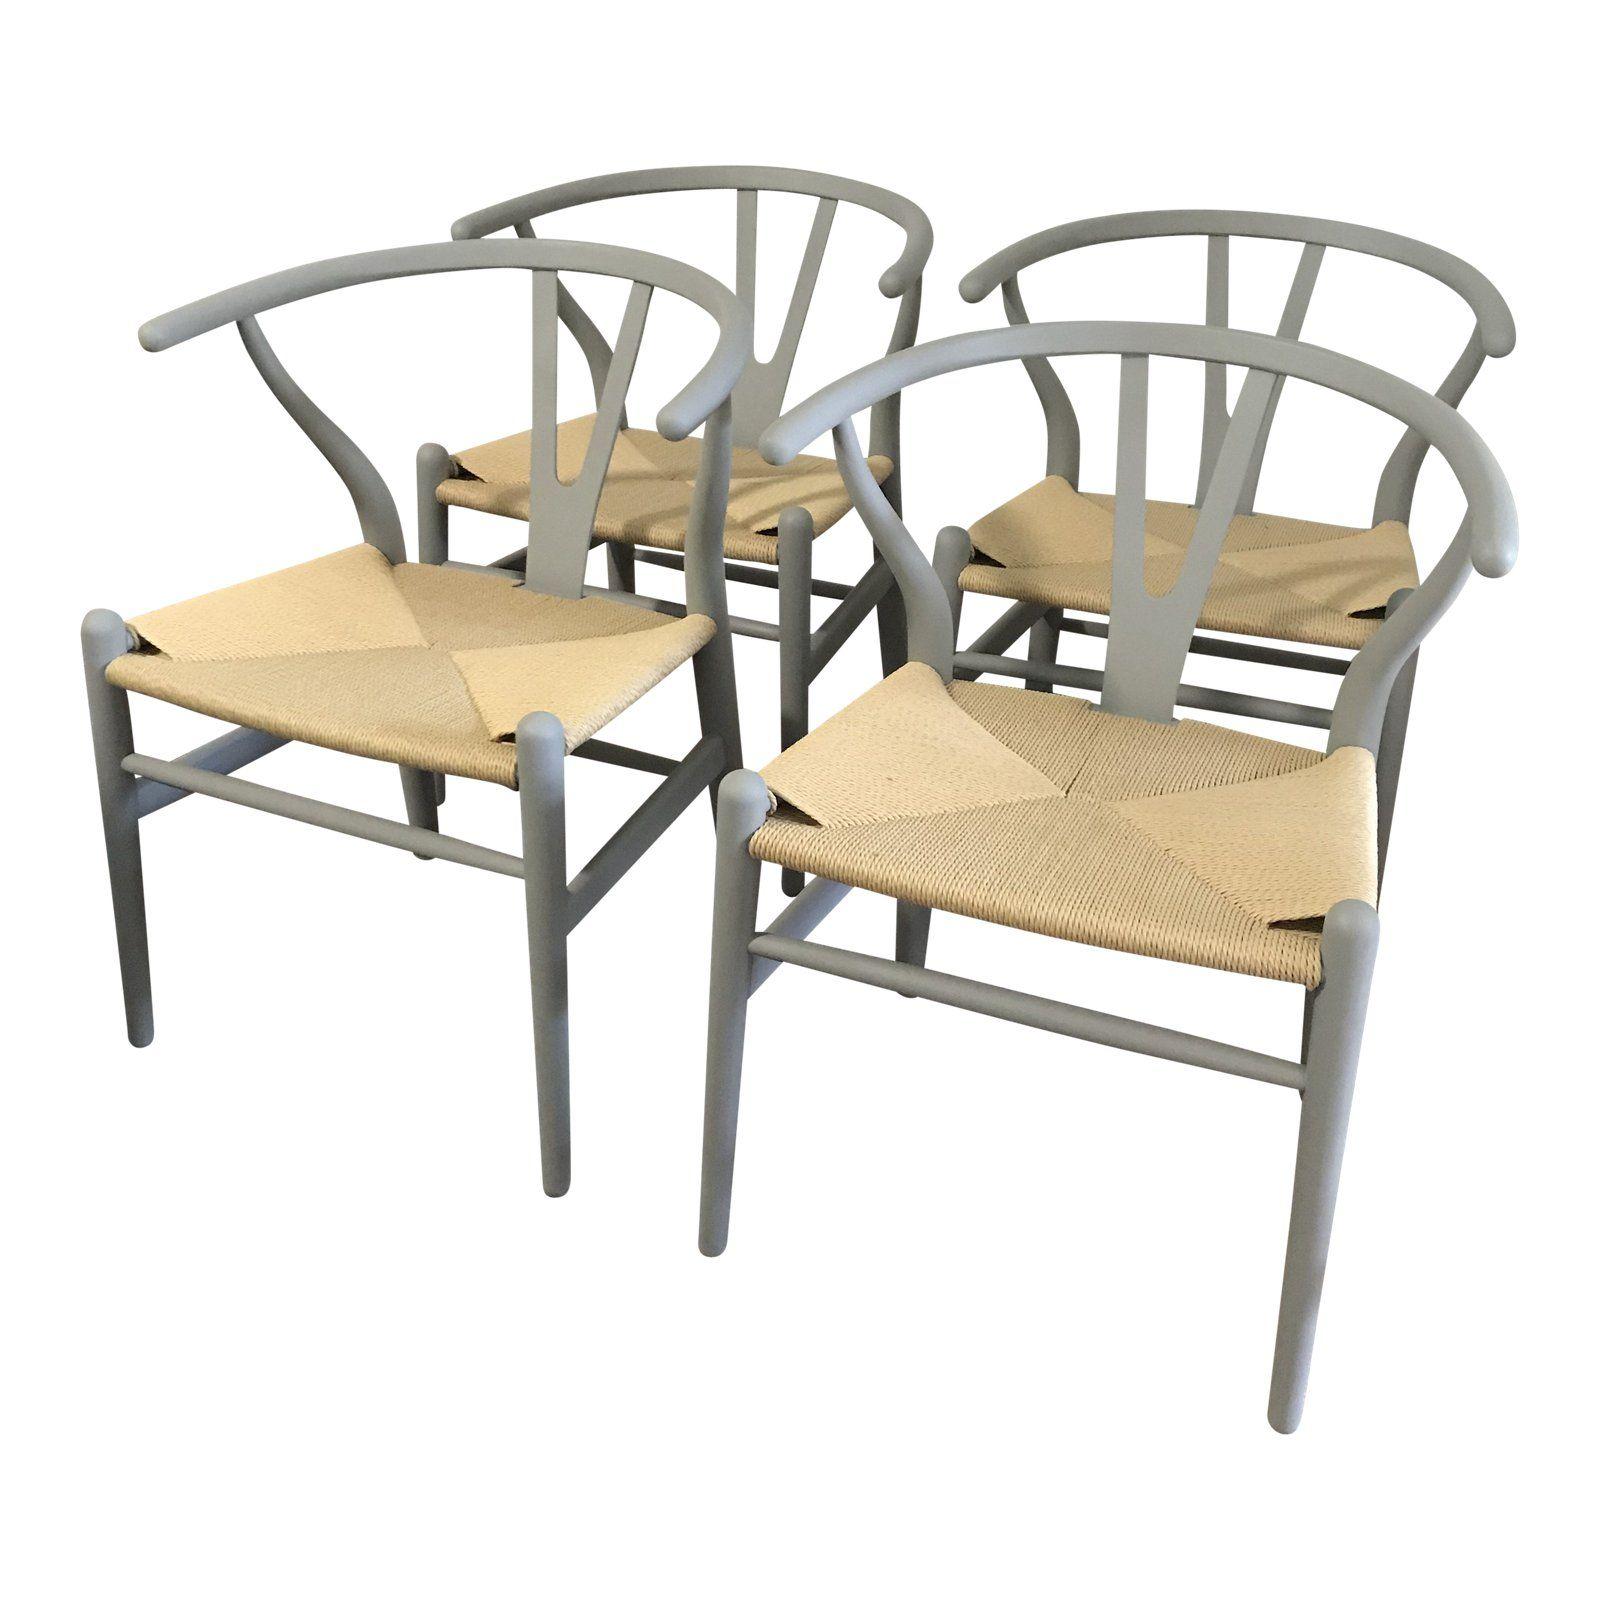 Set of 4 Wishbone Chairs by StilnovoUSA Chair, Wishbone